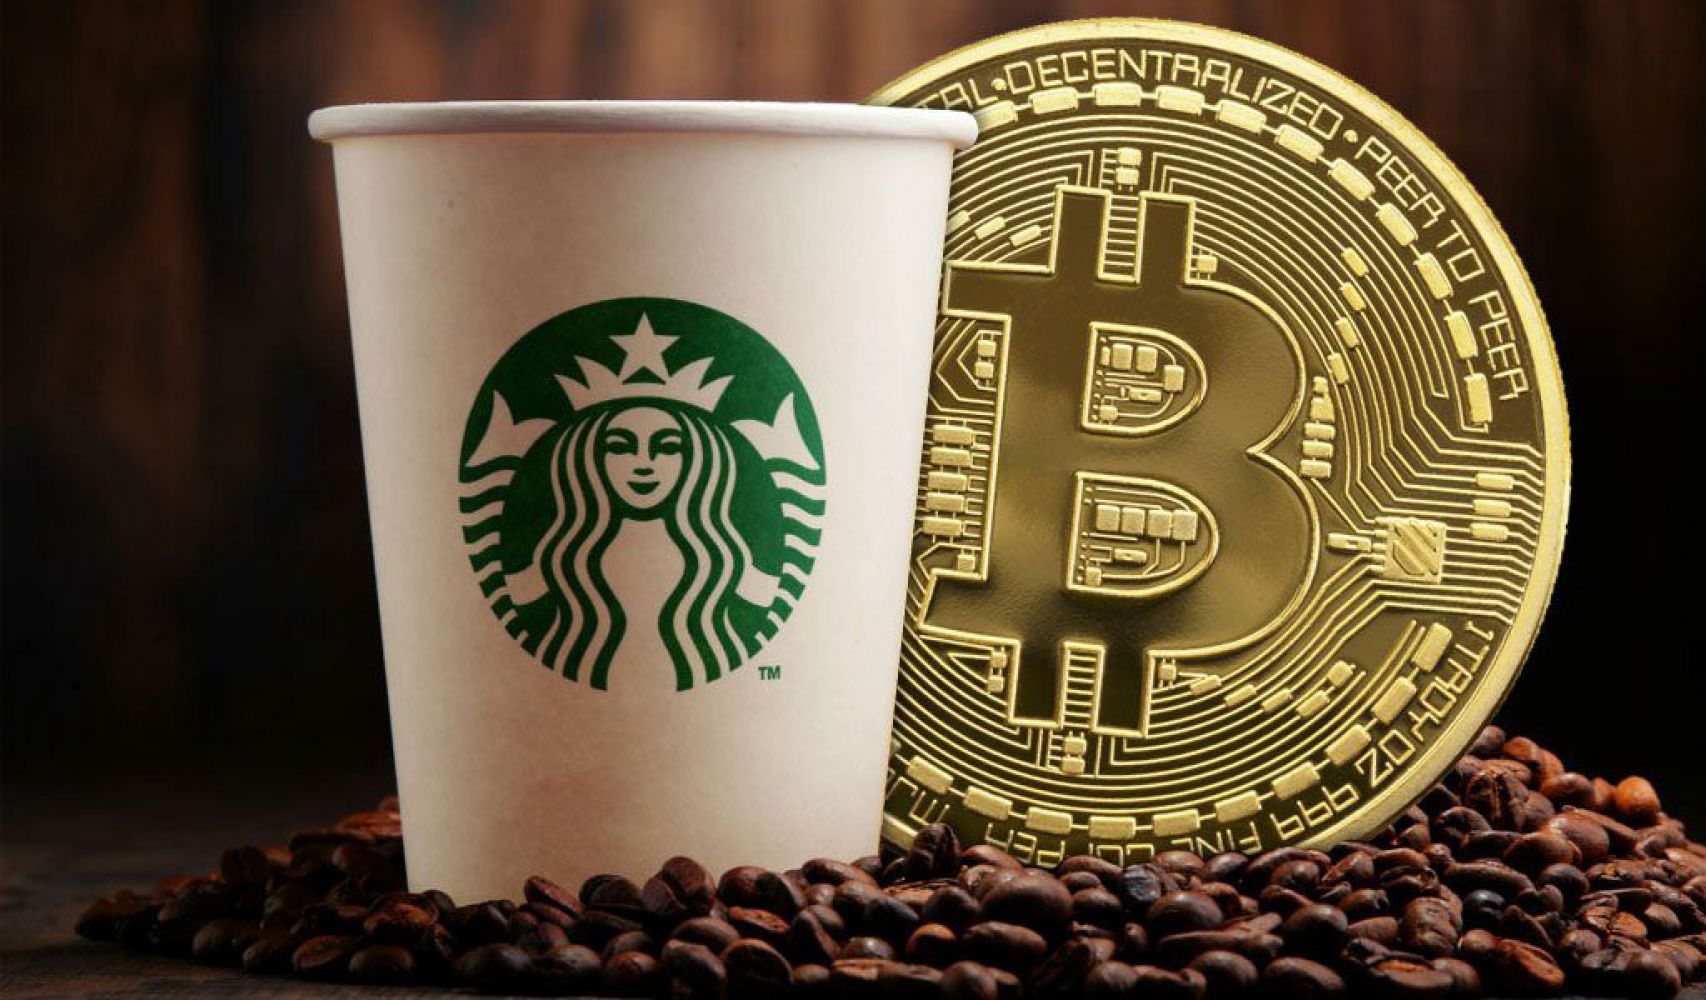 Starbucks plans to start using Crypto